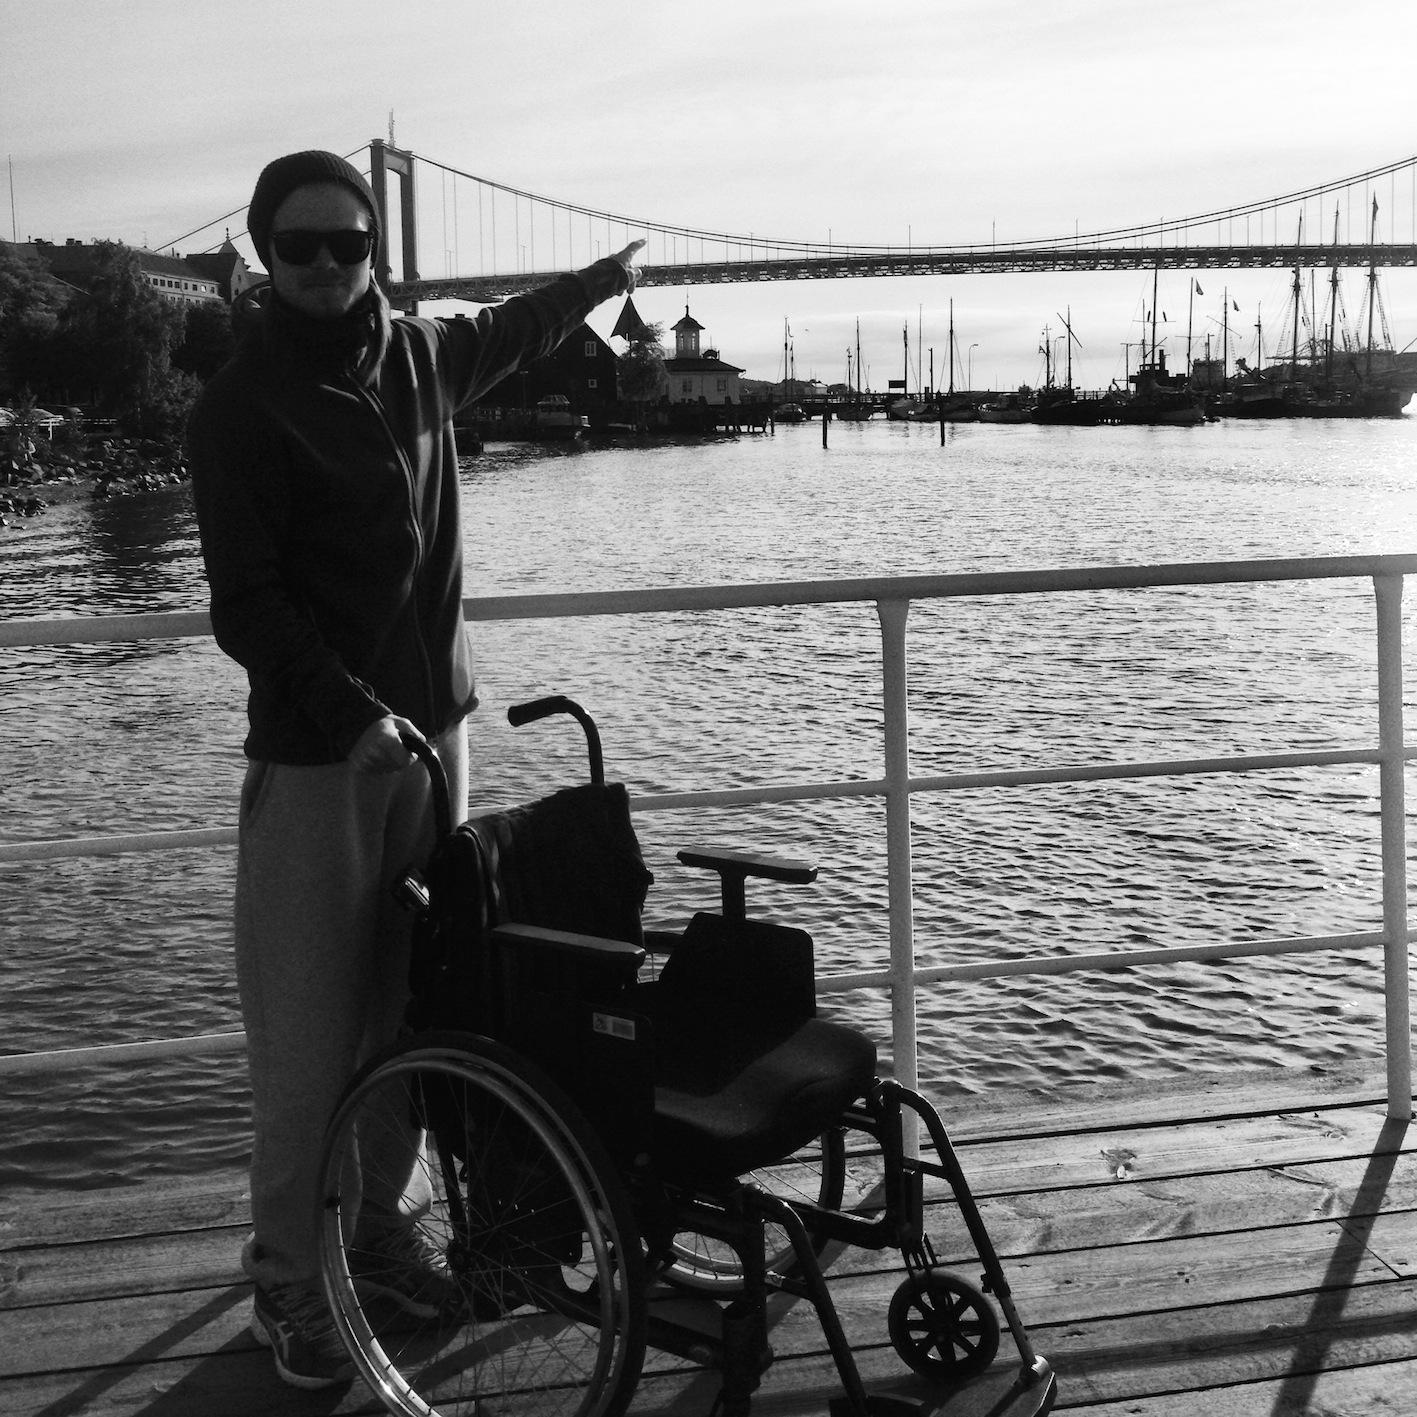 alvsborgsbron-rullstol-peka-edh